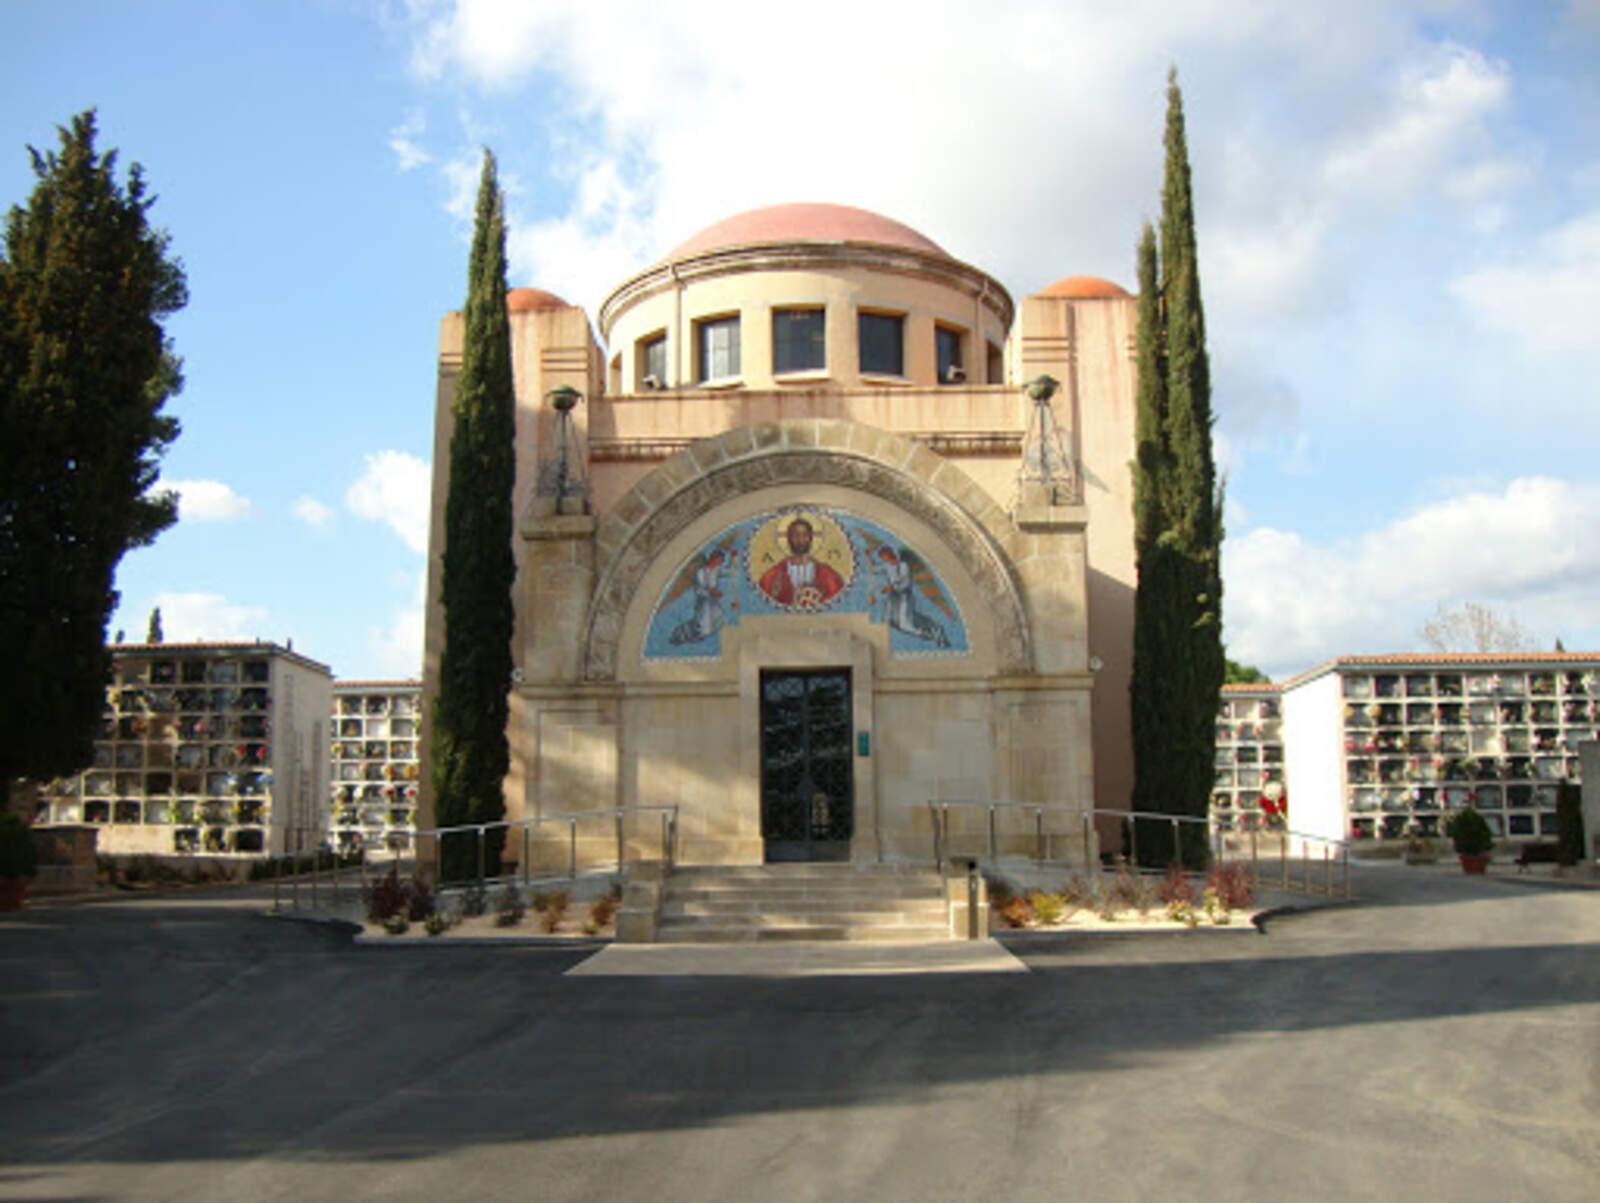 El temple multiconfessional de Terrassa